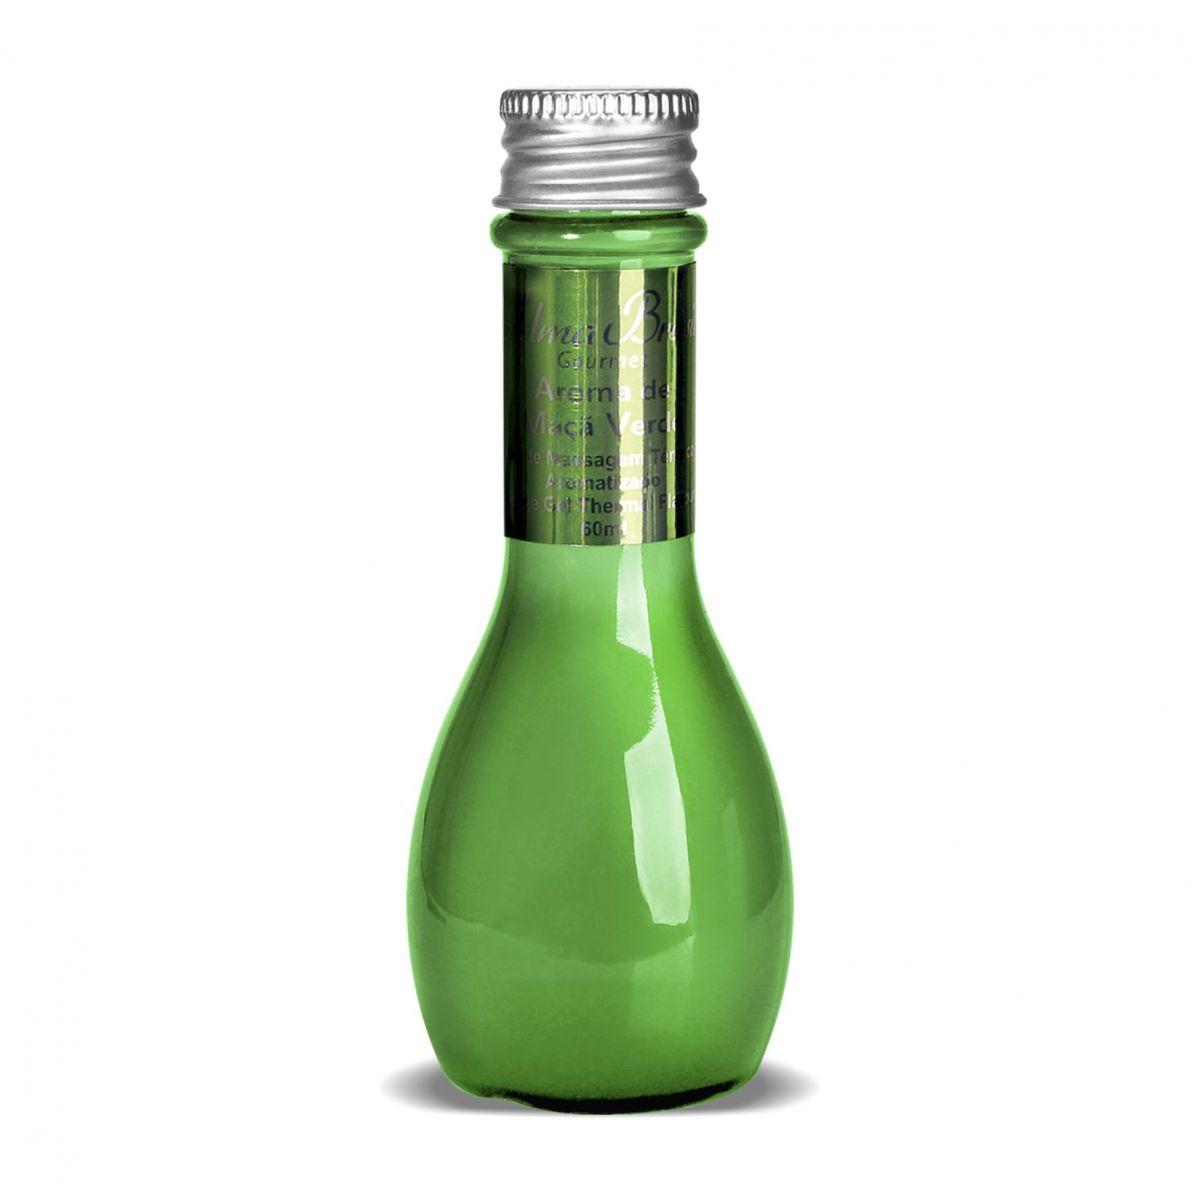 Gel de massagem térmico aromatizado lubrificante Gourmet Maca Verde 60ml  - Alma Brasil Cosméticos